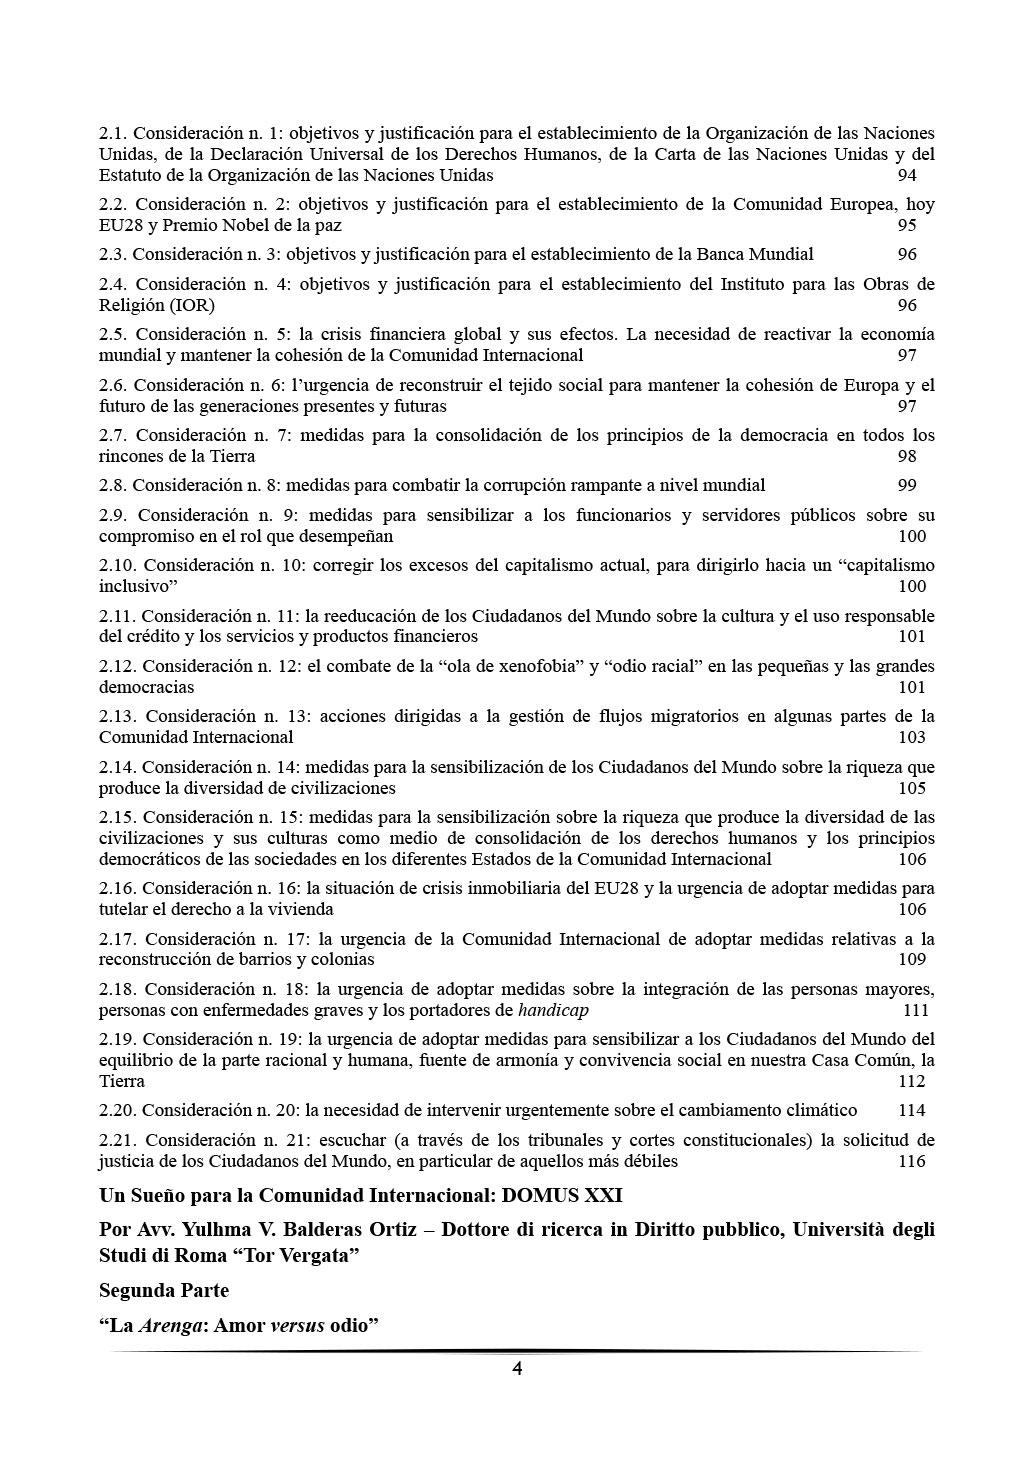 VERSION-ESPAGNOLO-DOMUS-XXI-(DIVISA-IN-PARTI)-3-FEBBRAIO-2016-2-4